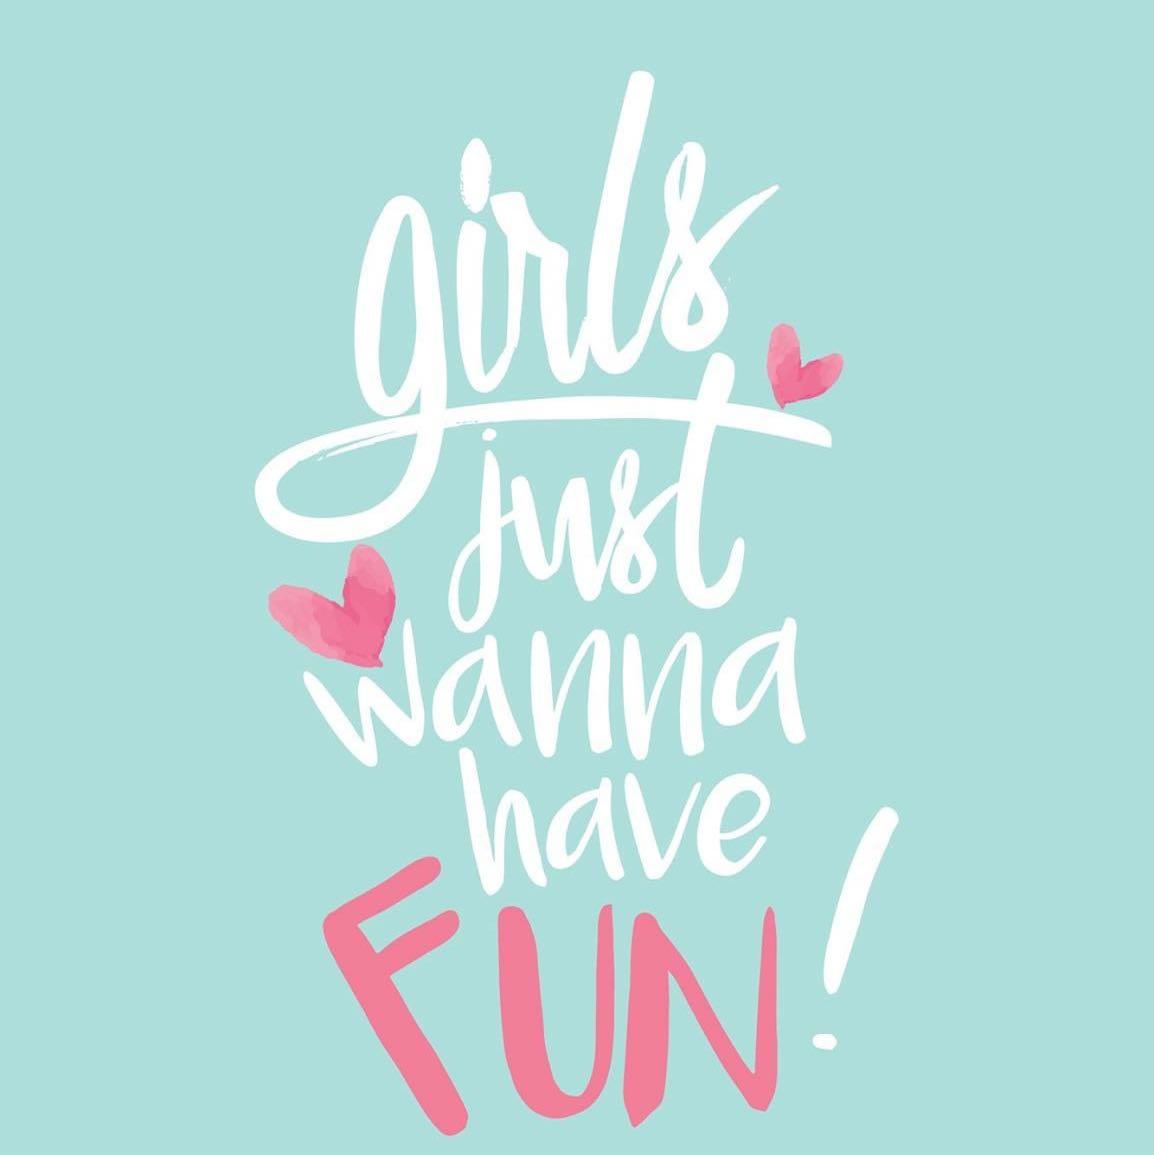 girlsiestuff